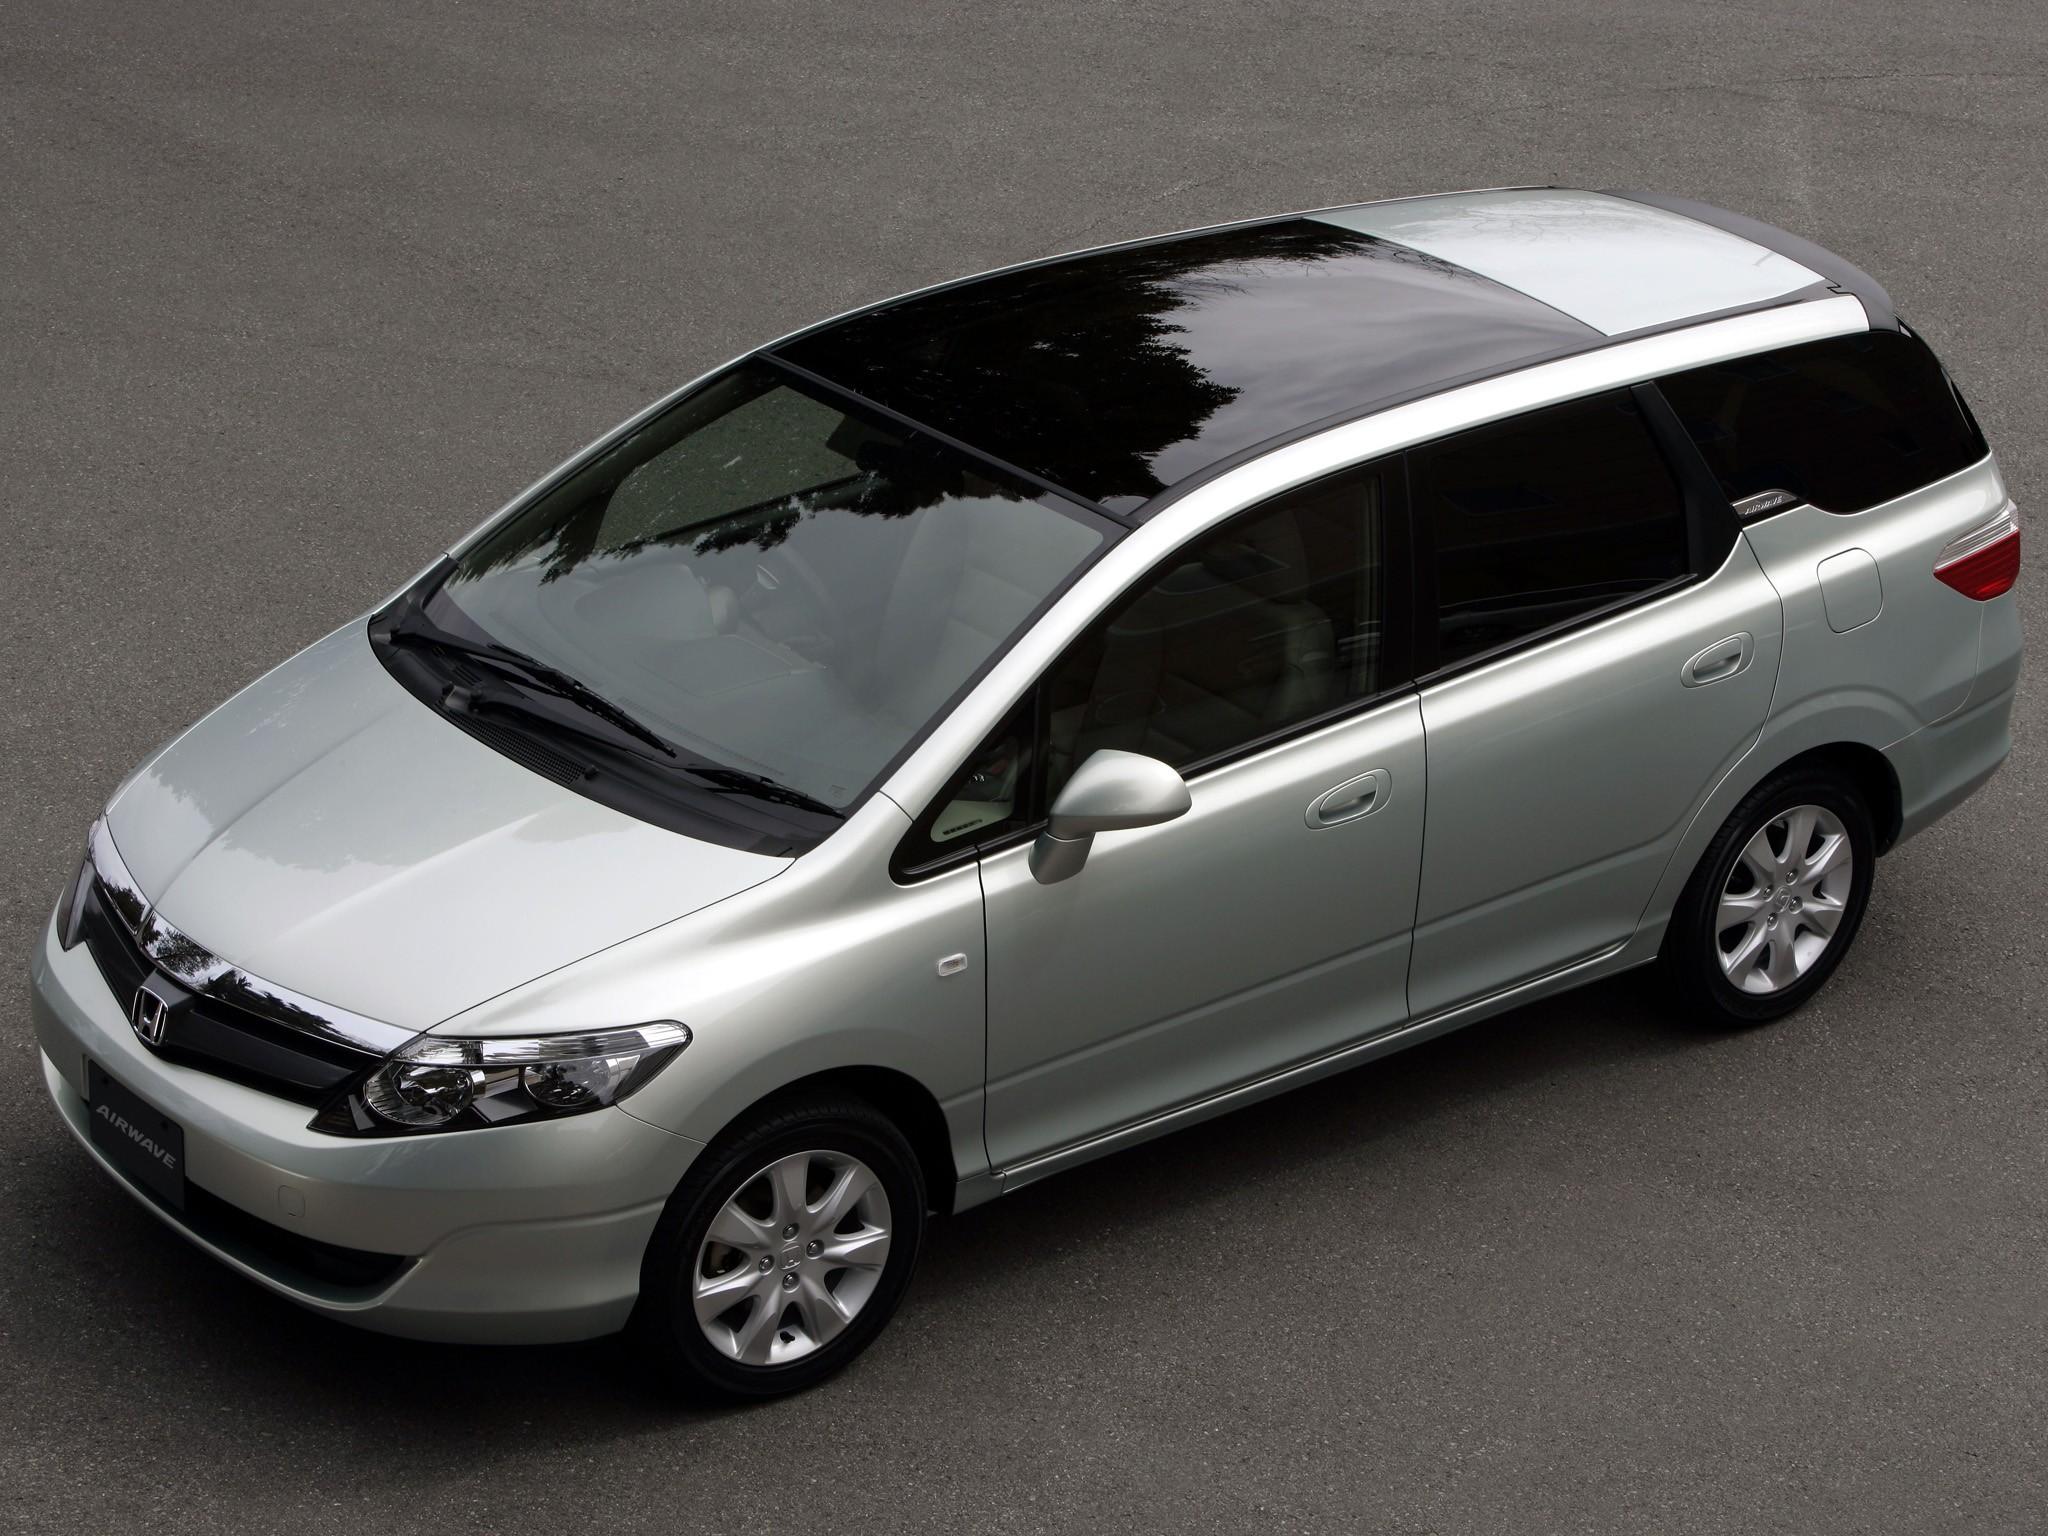 Honda Airwave 2008 - 2010 Station wagon 5 door #4